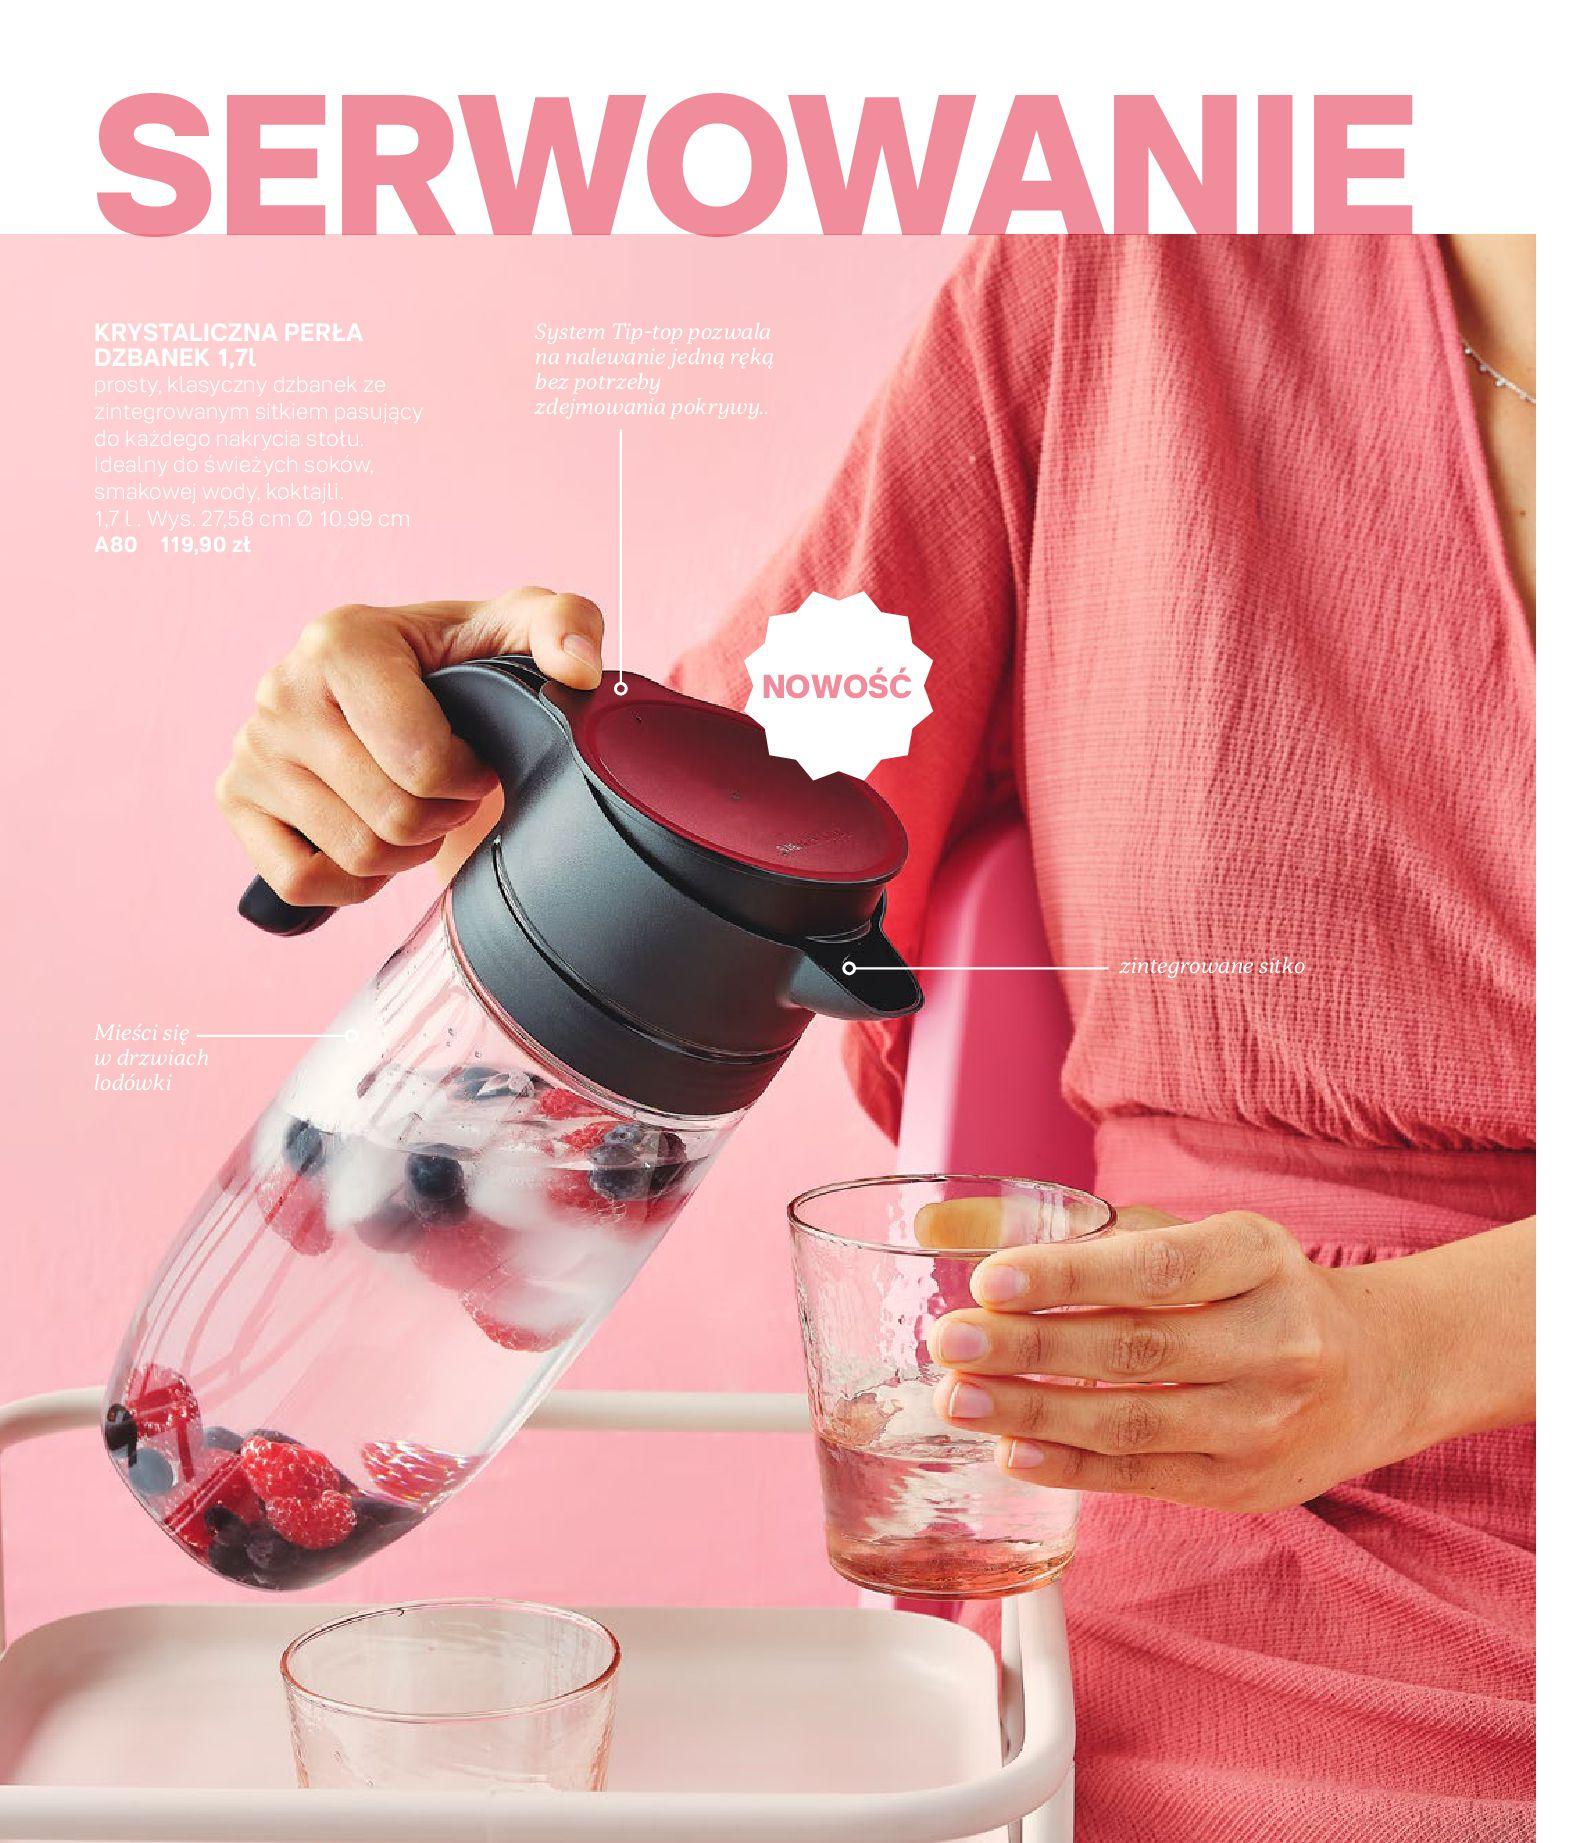 Gazetka Tupperware: Gazetka Tupperware - Katalog wiosna/ lato 2021-05-10 page-18